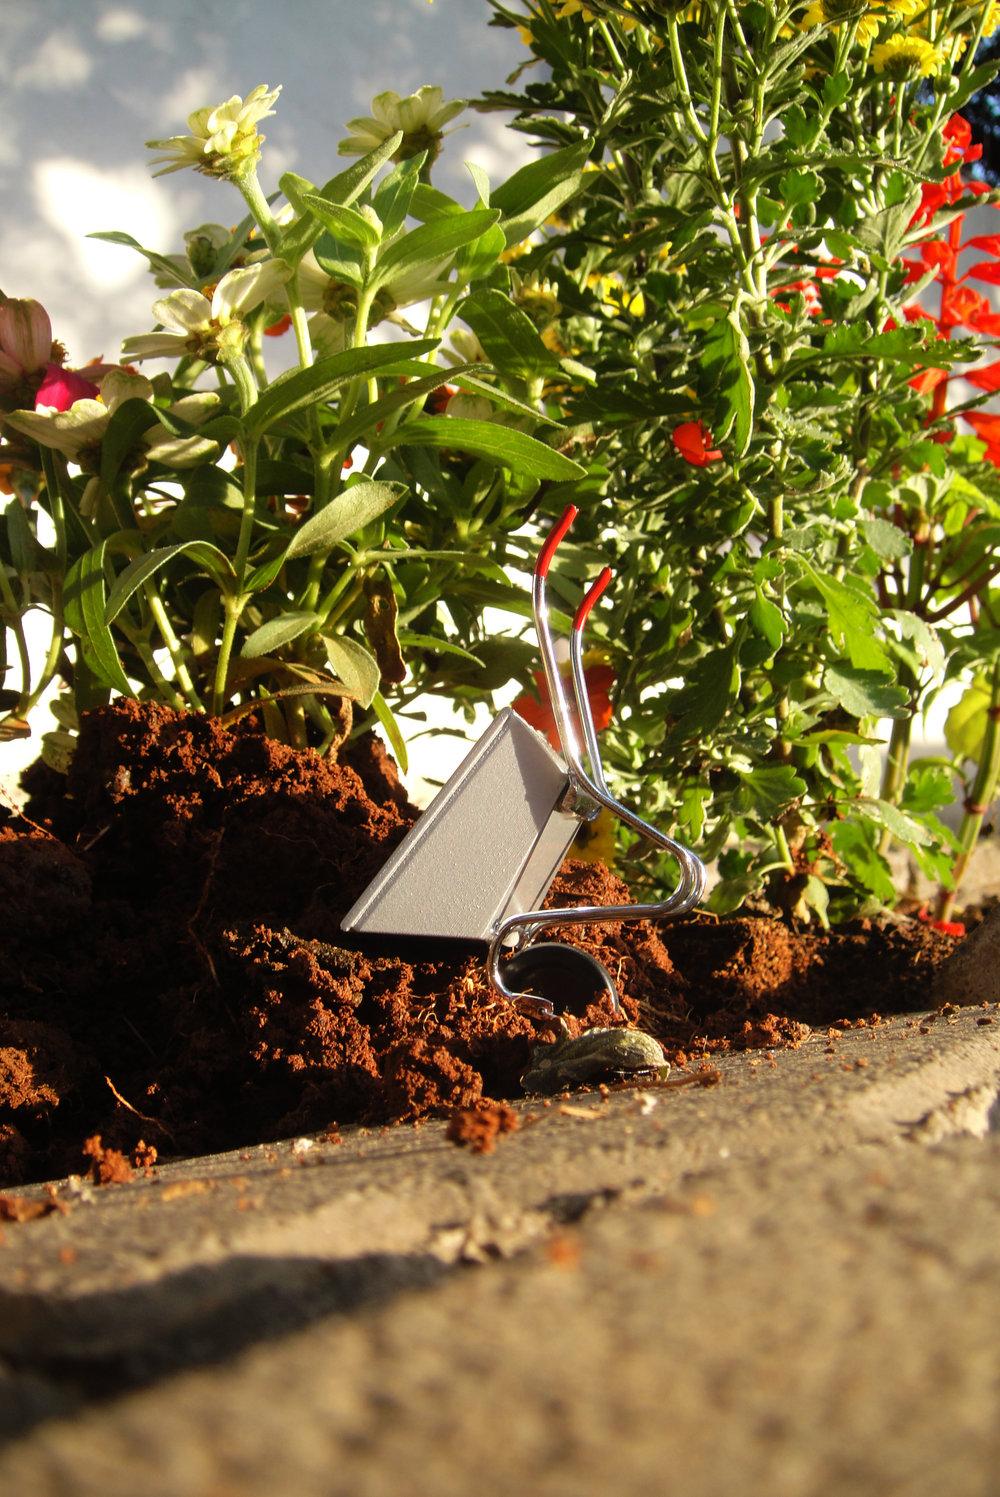 Pothole gardener steve wheen guerilla gardening India